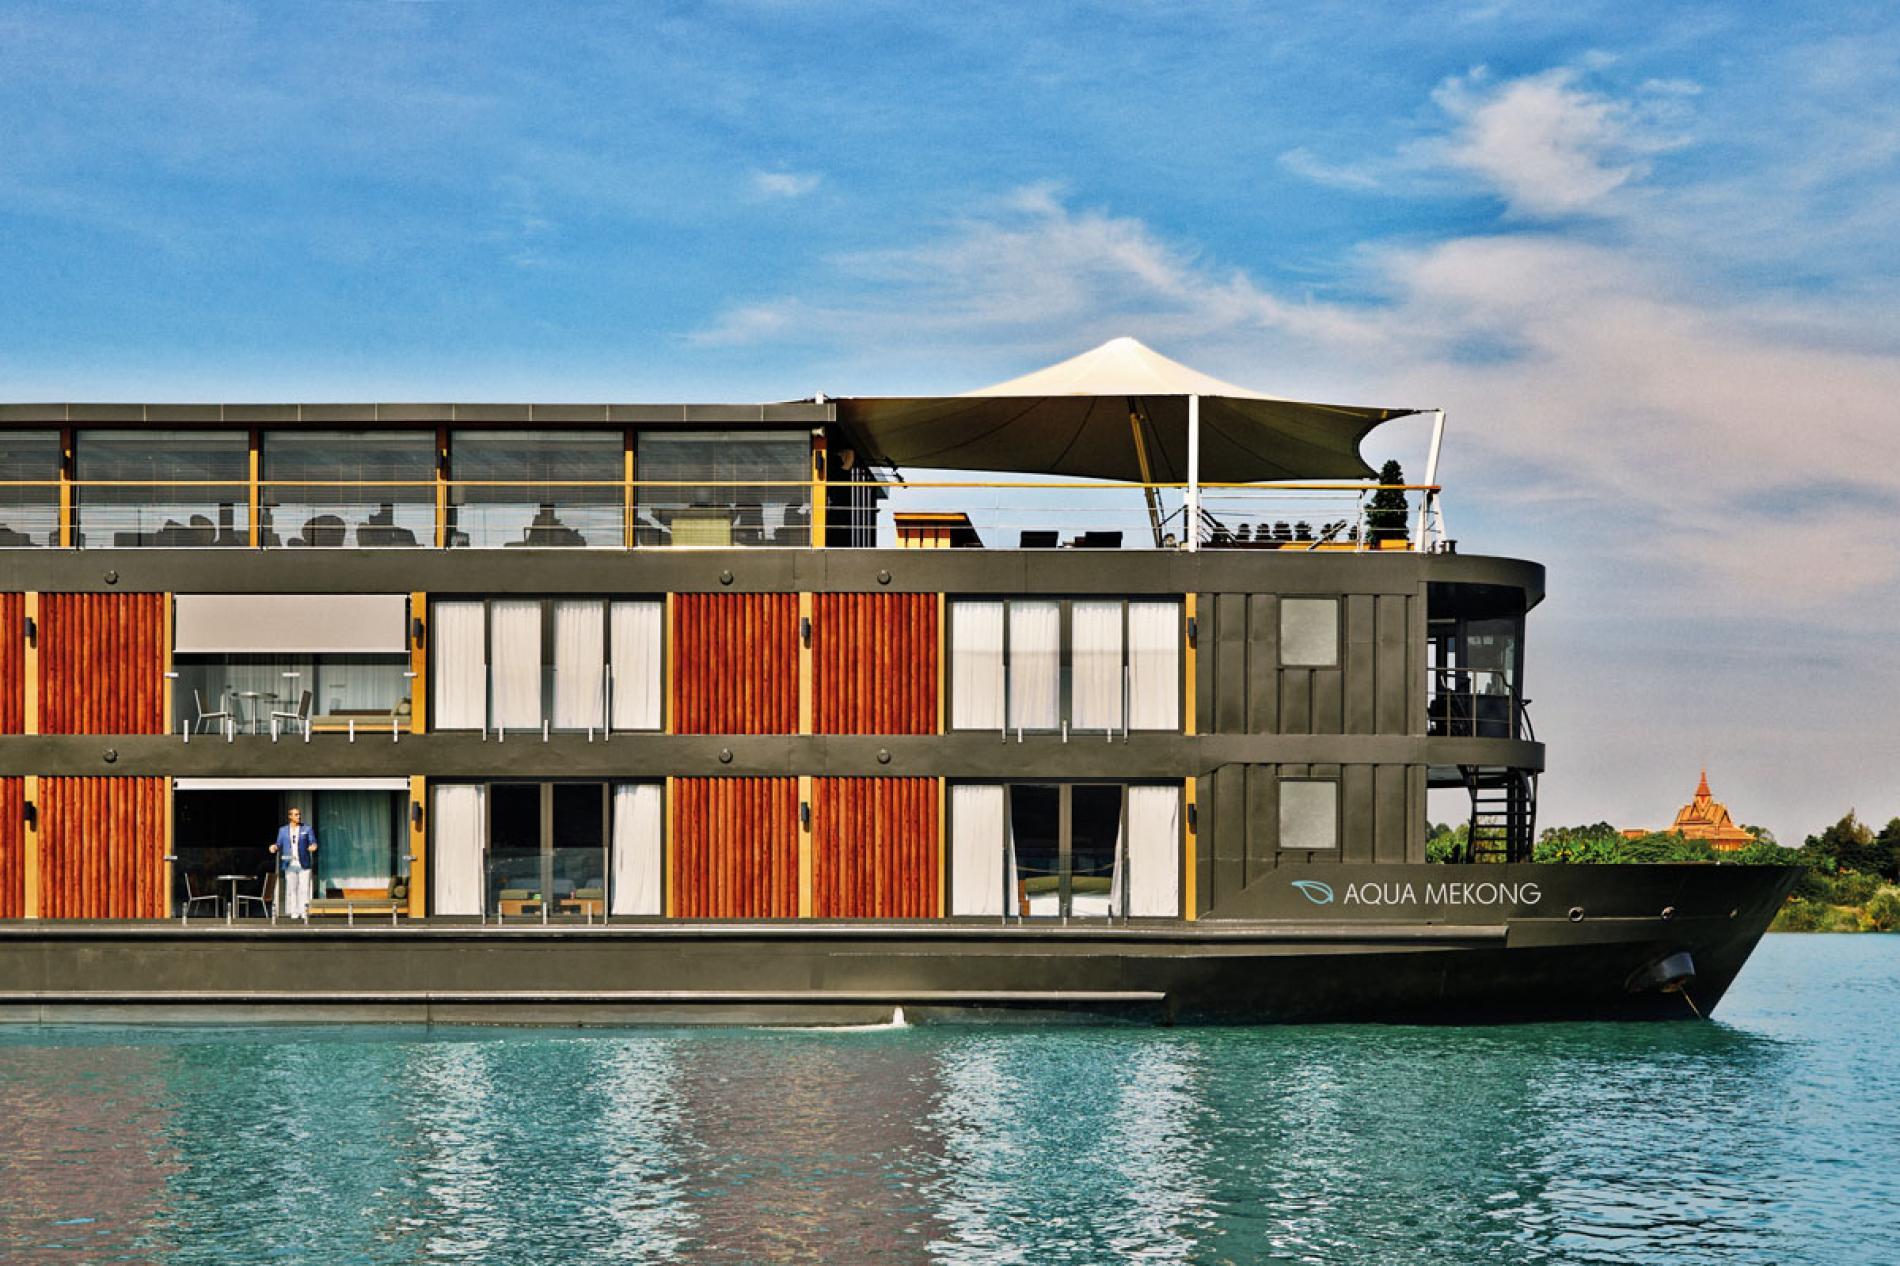 AQUA MEKONG - Luxury Motor Yacht For Charter - Exterior Design - Img 1   C&N